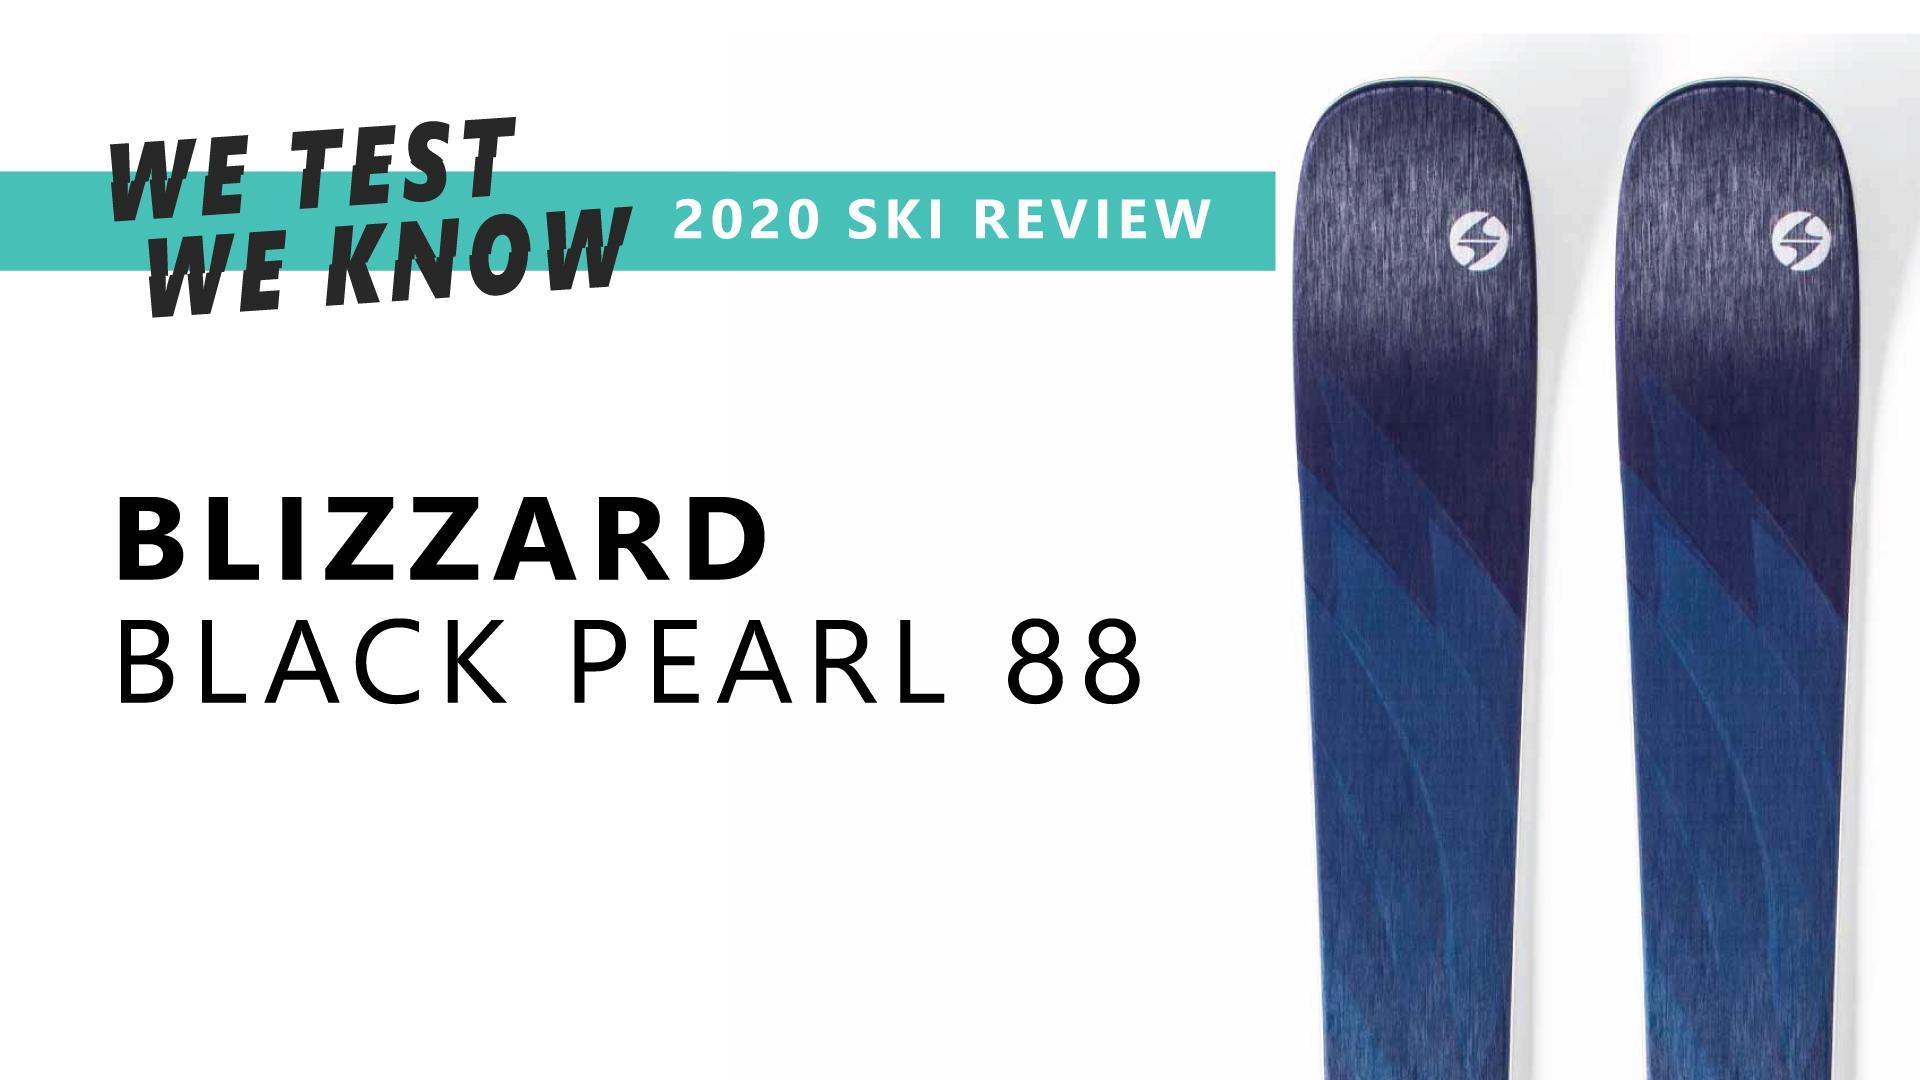 Black Pearl 88 - 2020 Ski Review